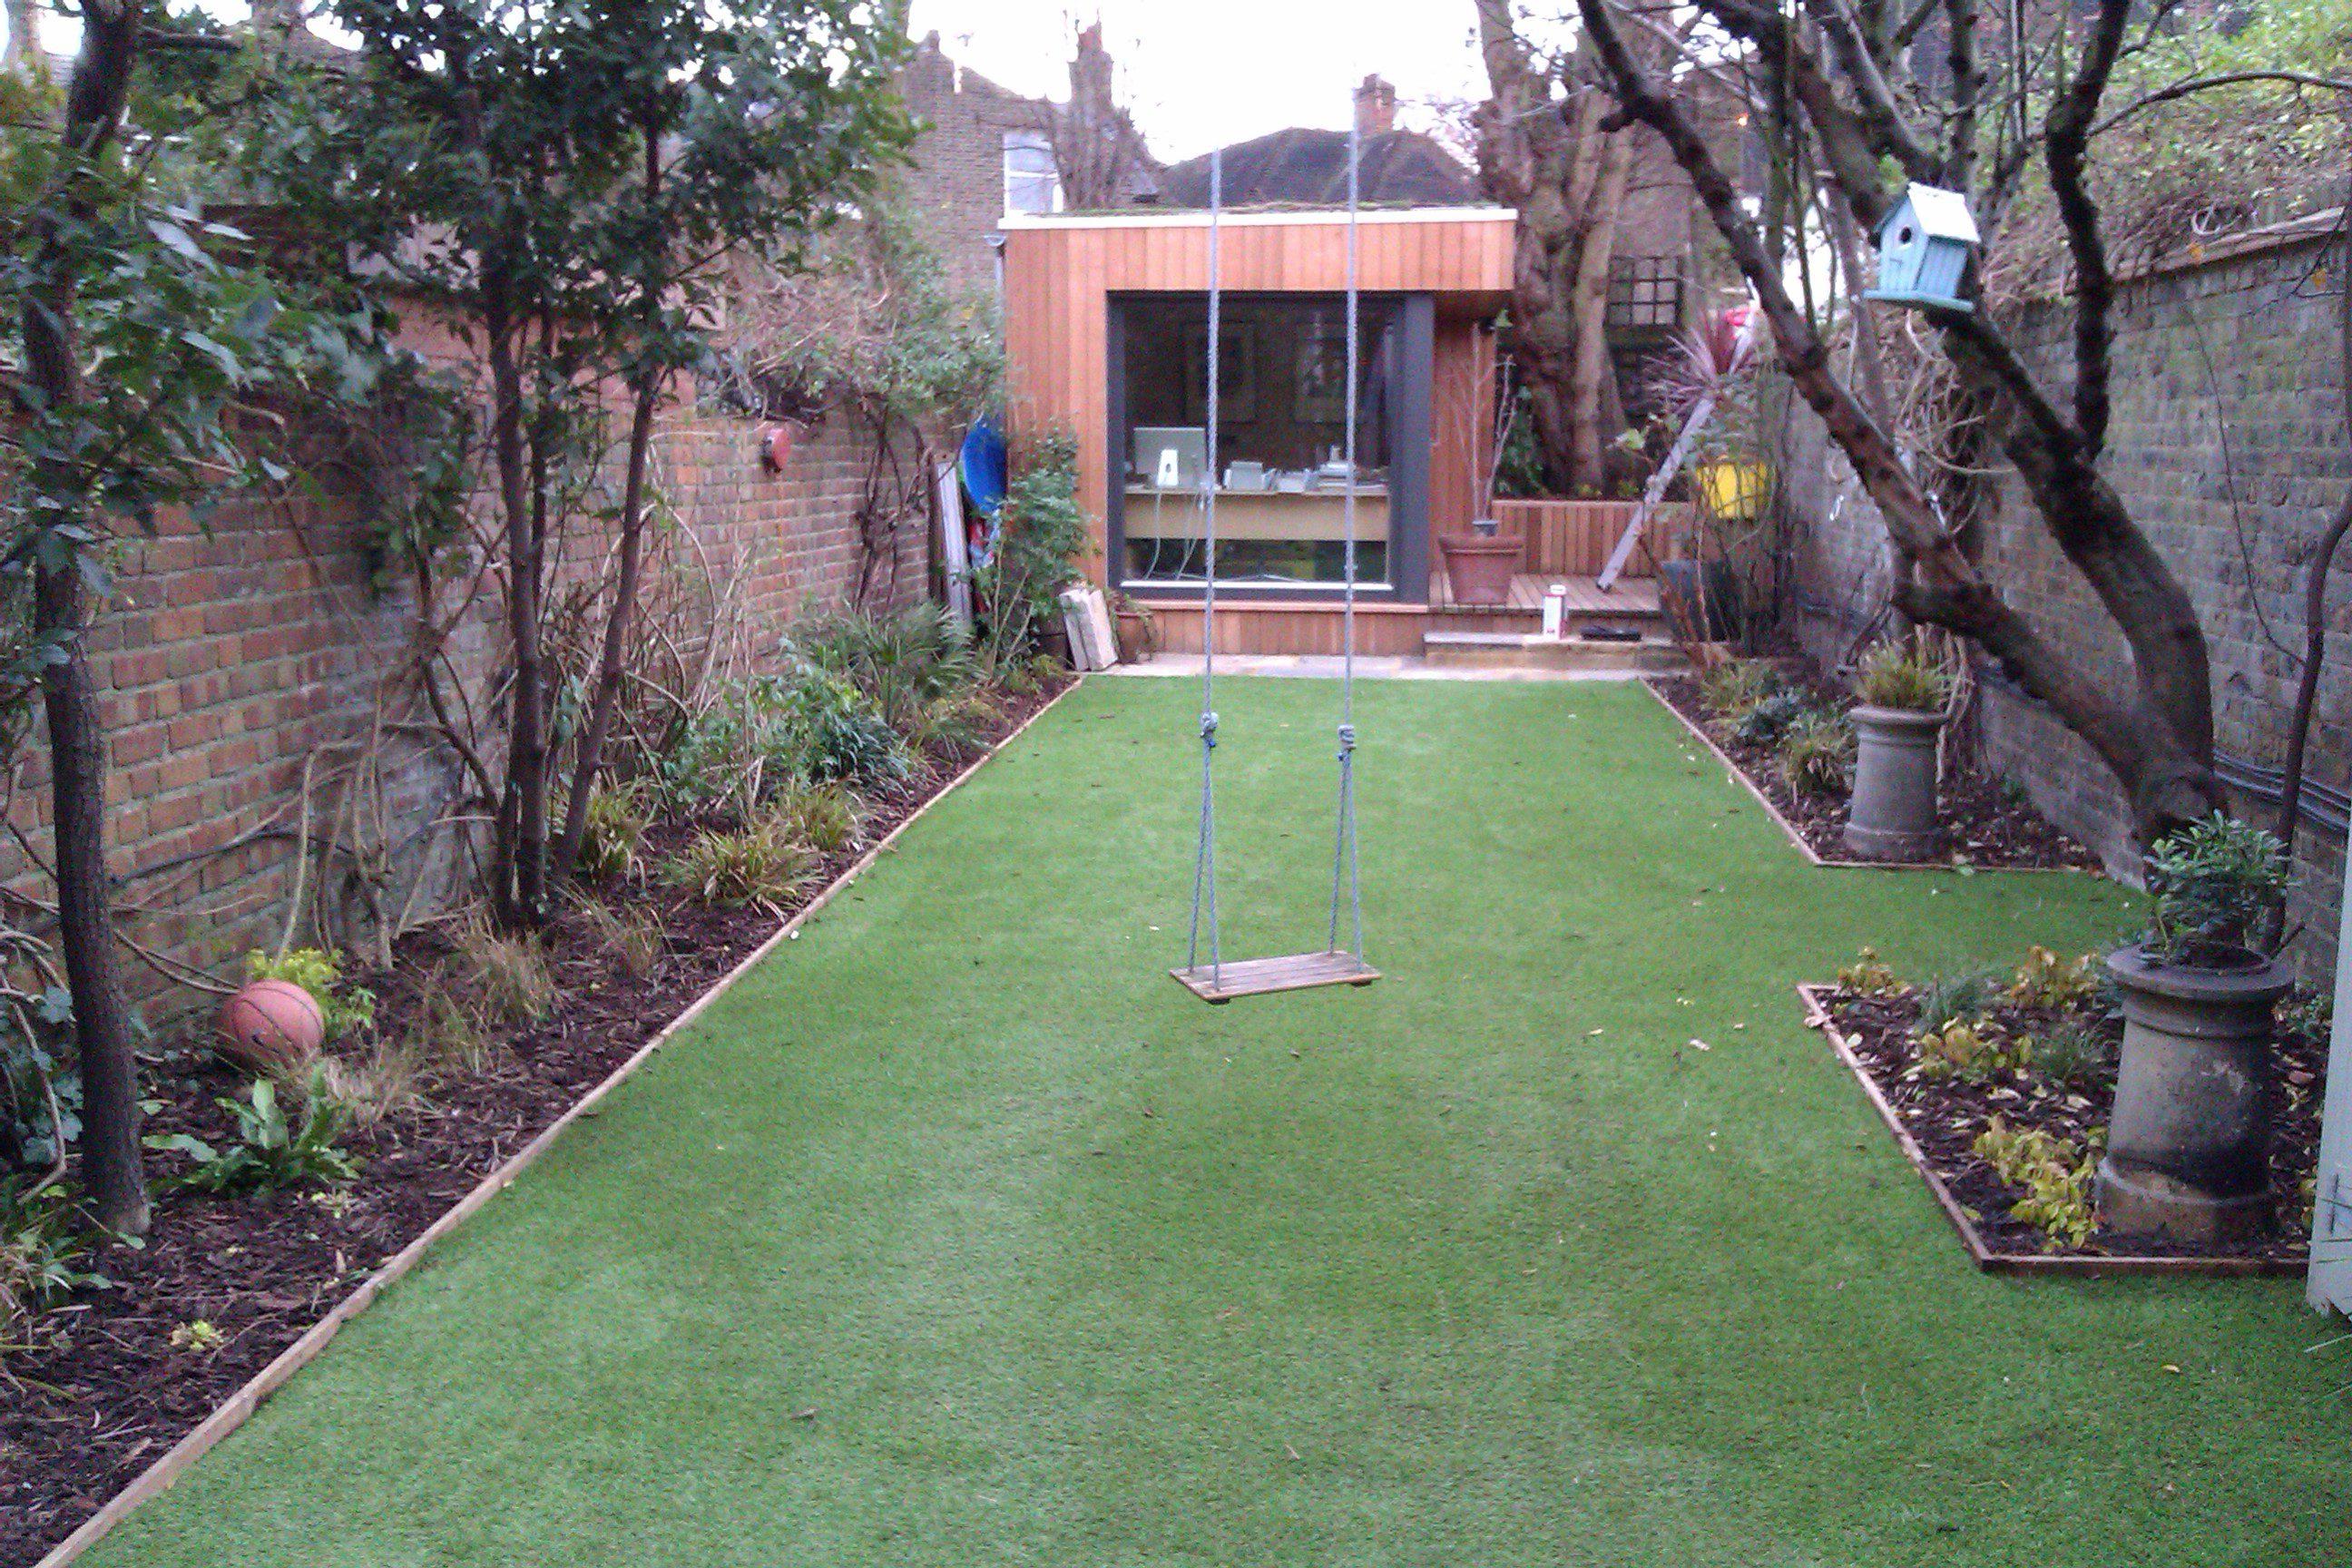 Garden Design Top Tips: I Fought the Lawn... - Earth ... on Patio And Grass Garden Ideas id=33540